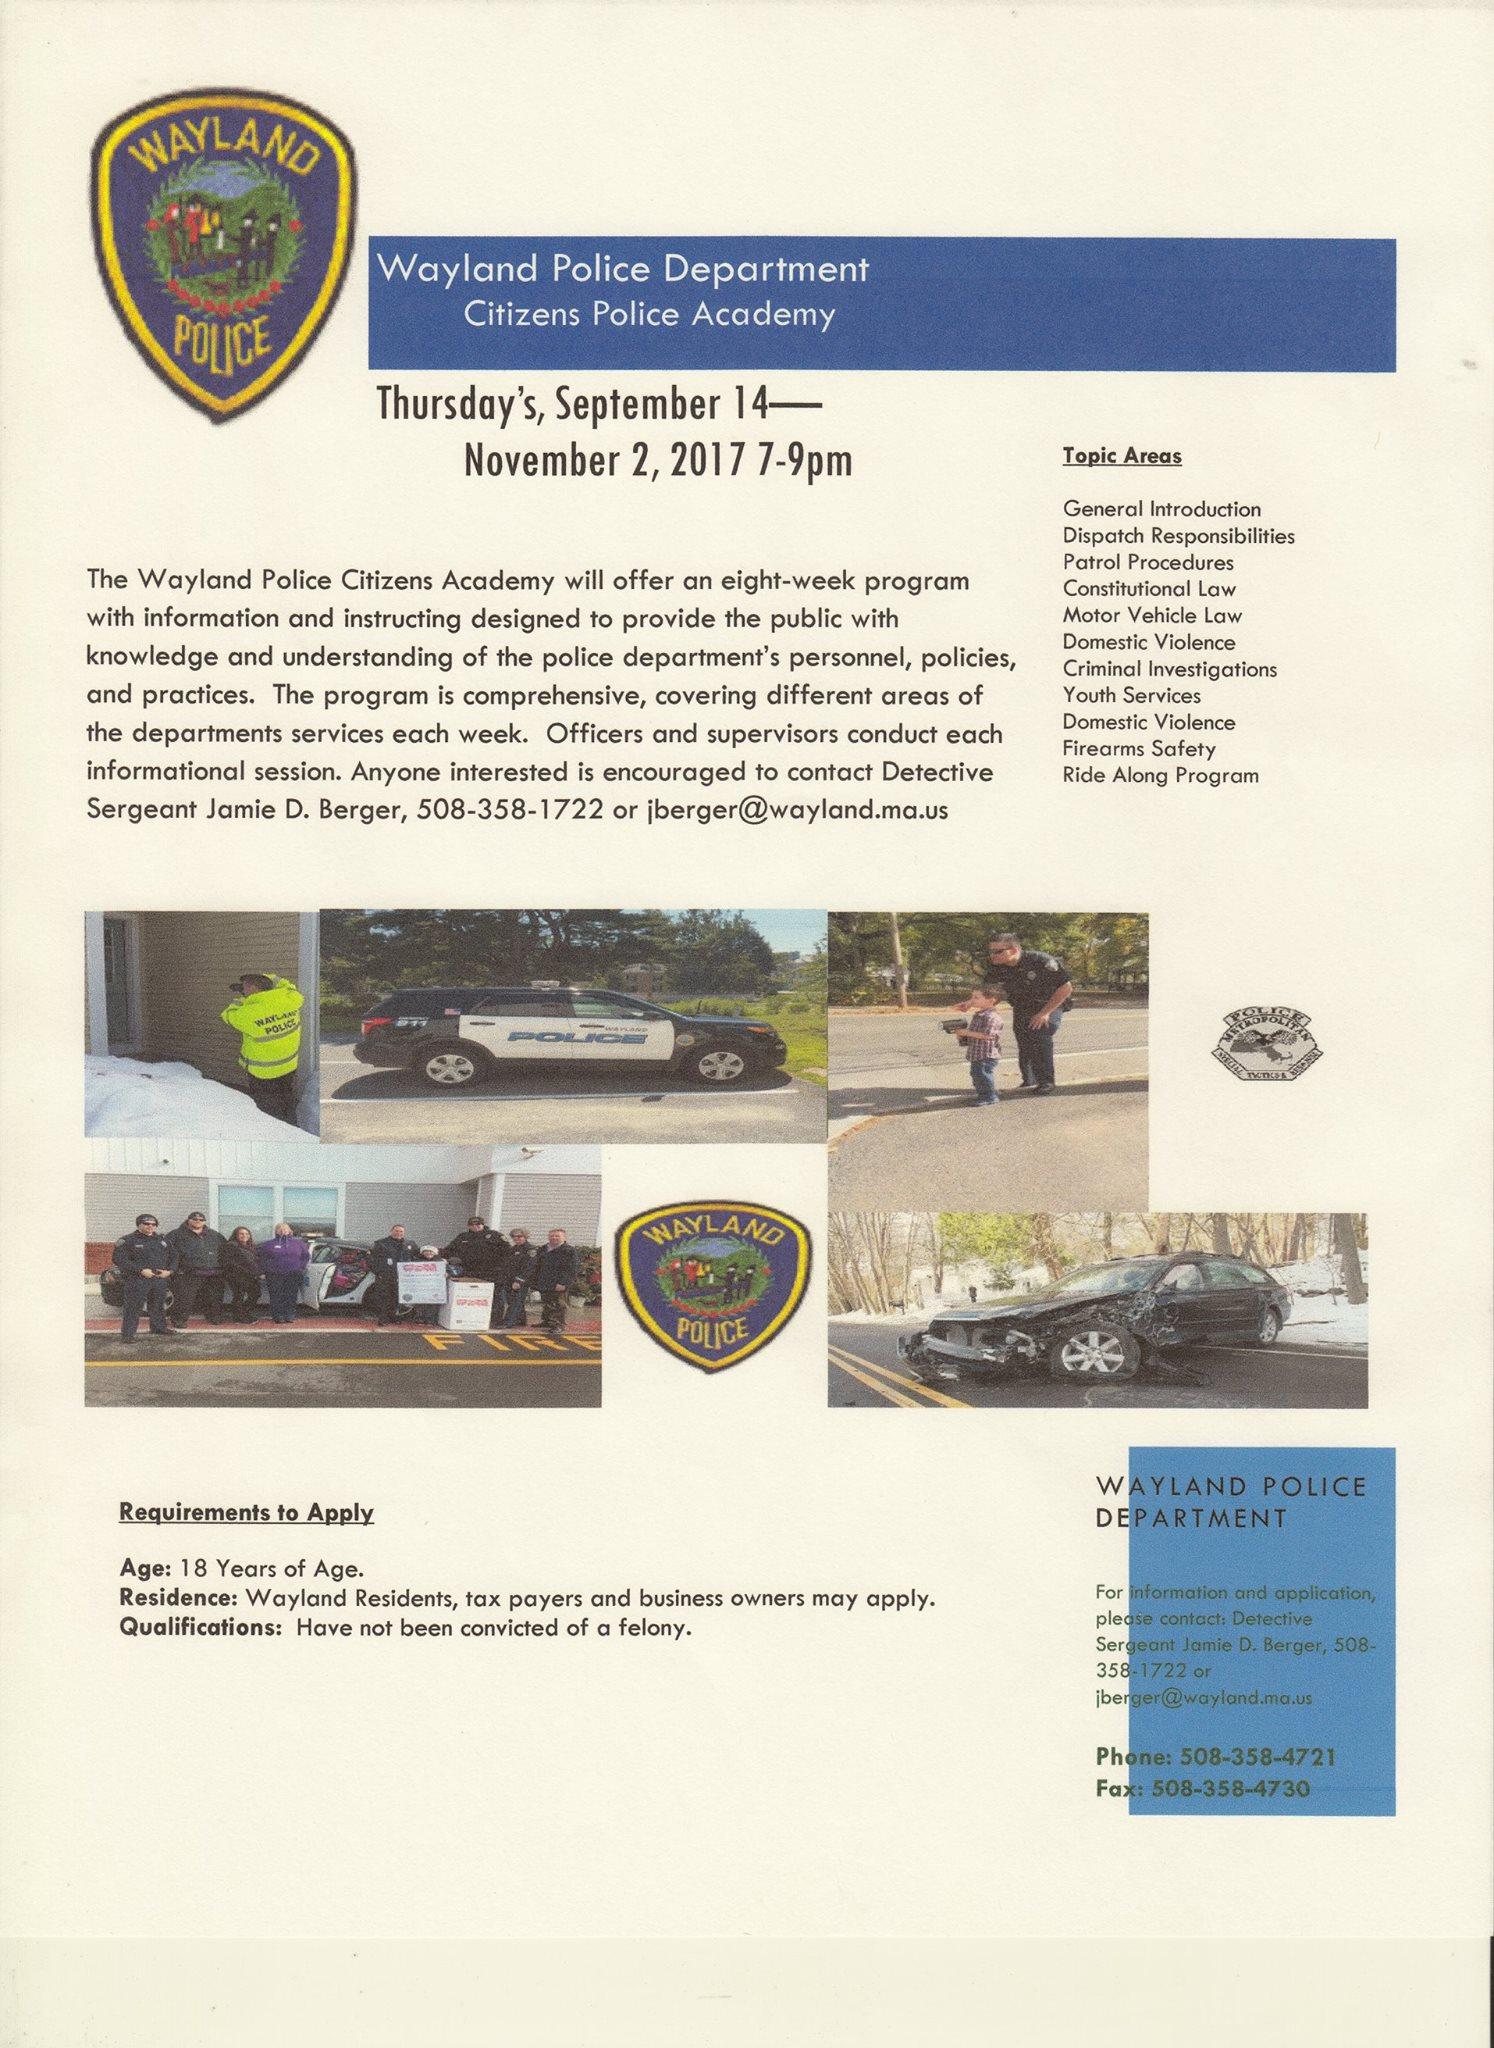 Police announce Citizen Police Academy beginning September